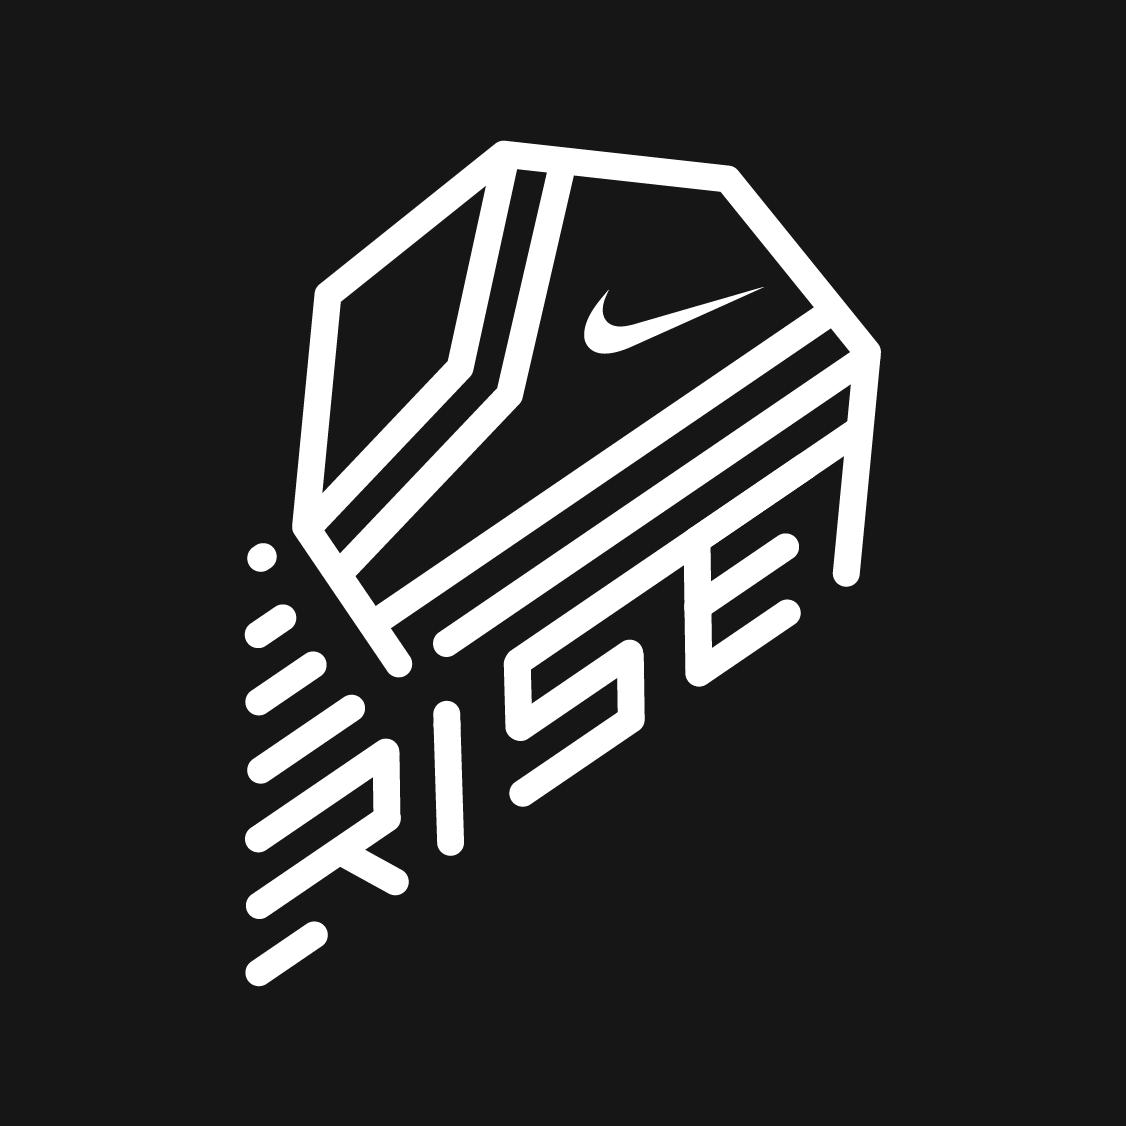 all-logos-2020-47